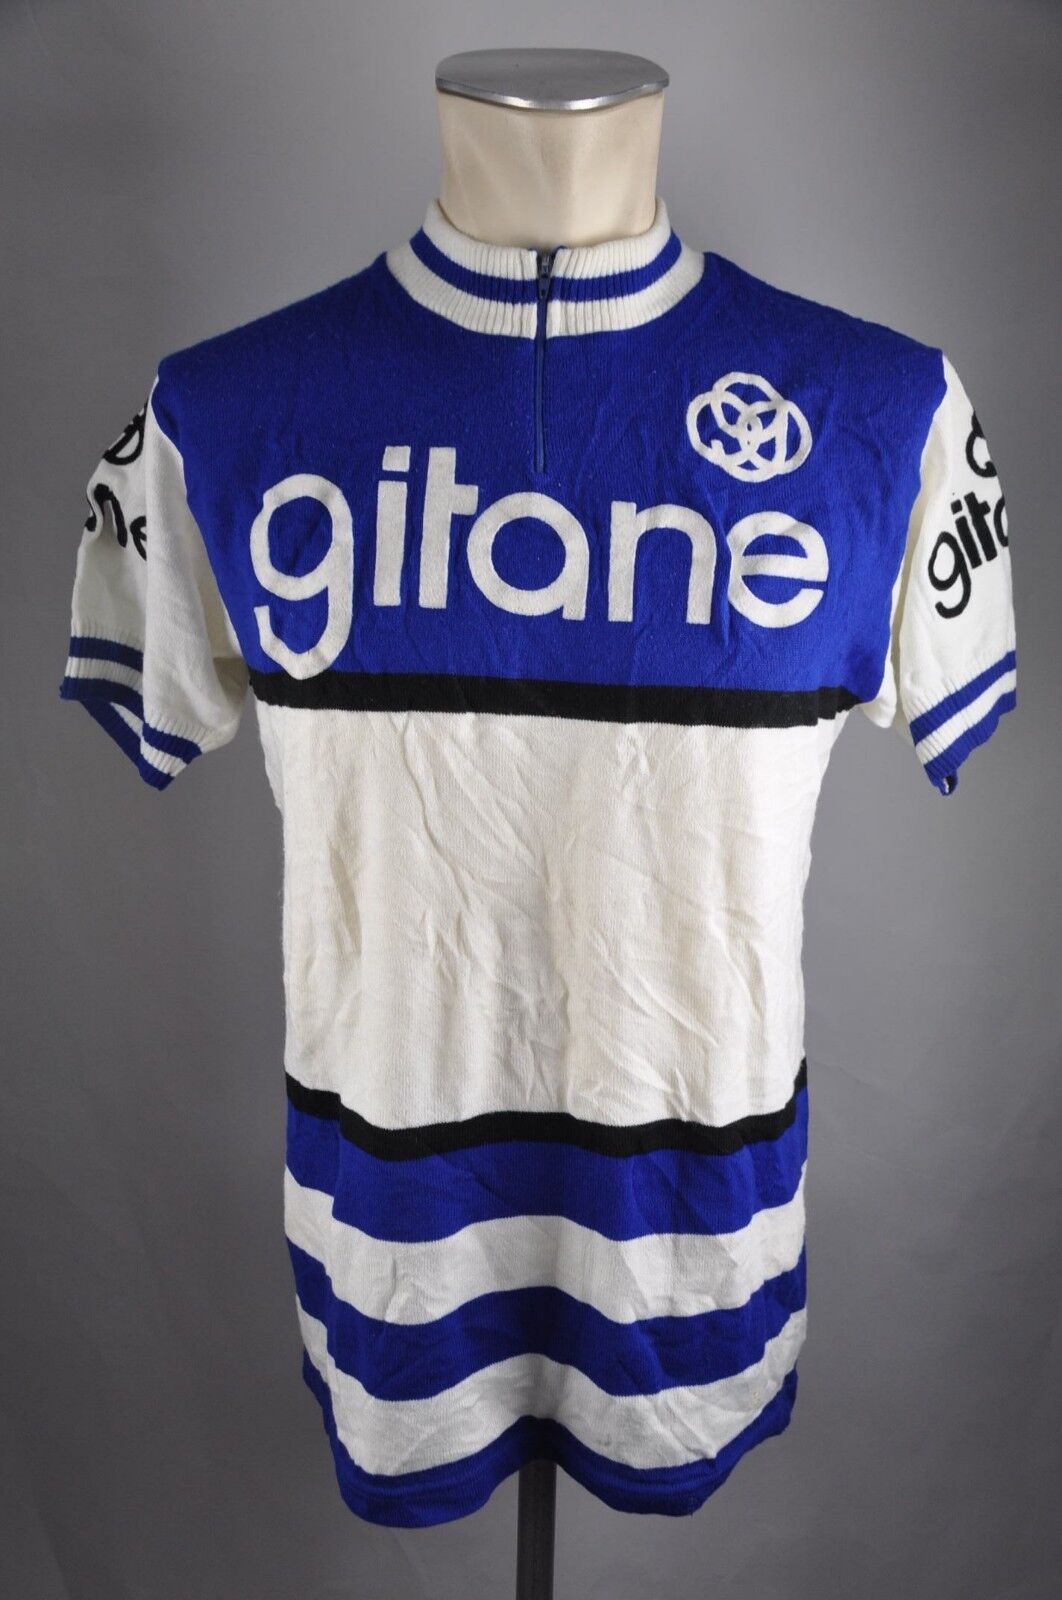 Gitane acrylique vintage jersey Tricot Tricot Tricot noret Gr. L BW 54cm Bike cycling BC2 3b801e